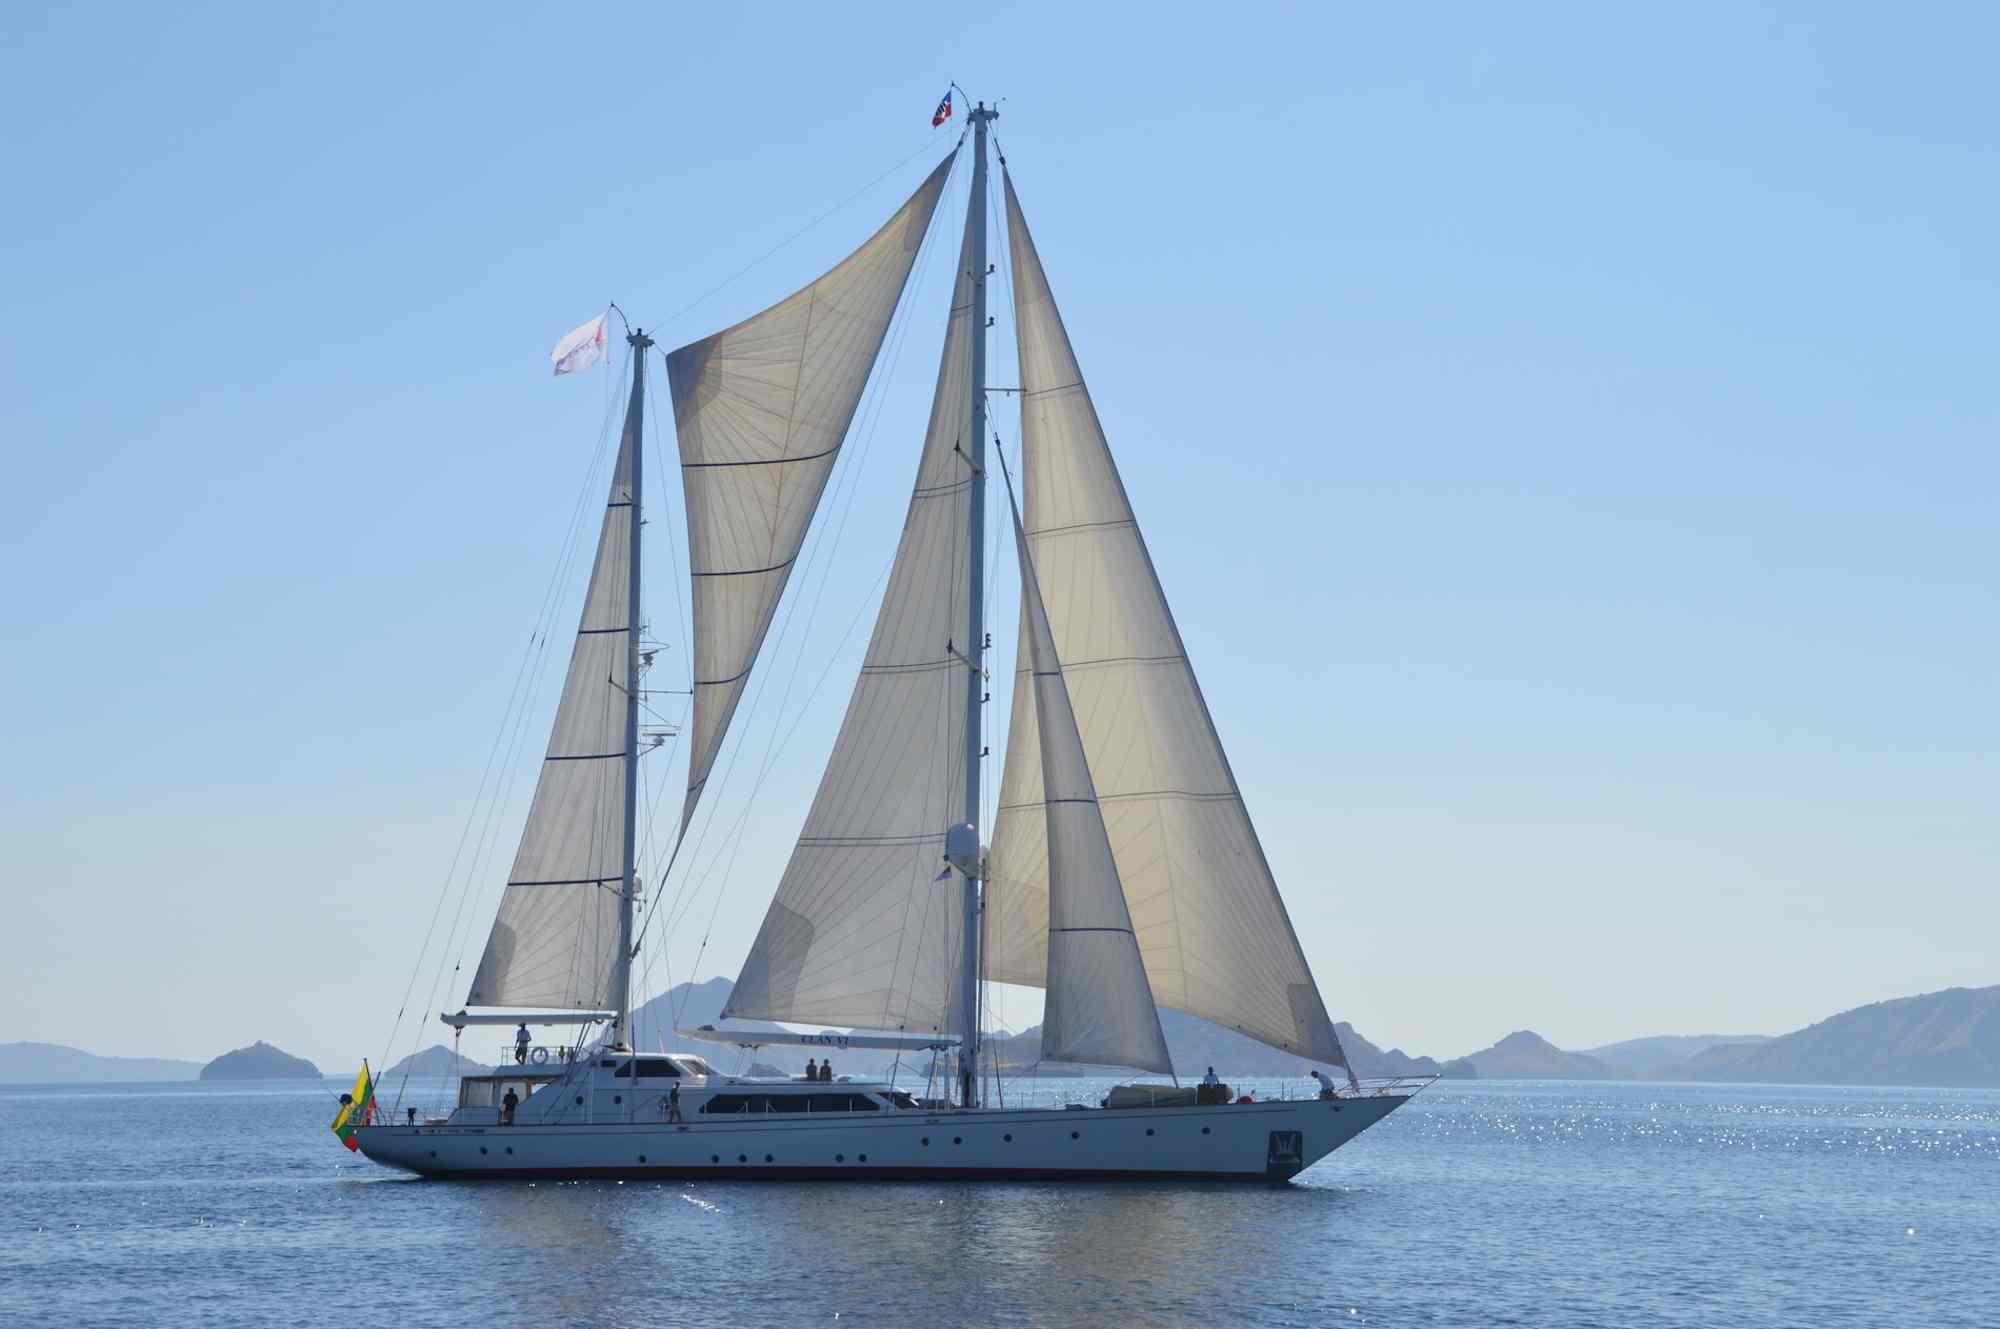 Clan VI_yacht under full sail in Mergui_XS.jpeg